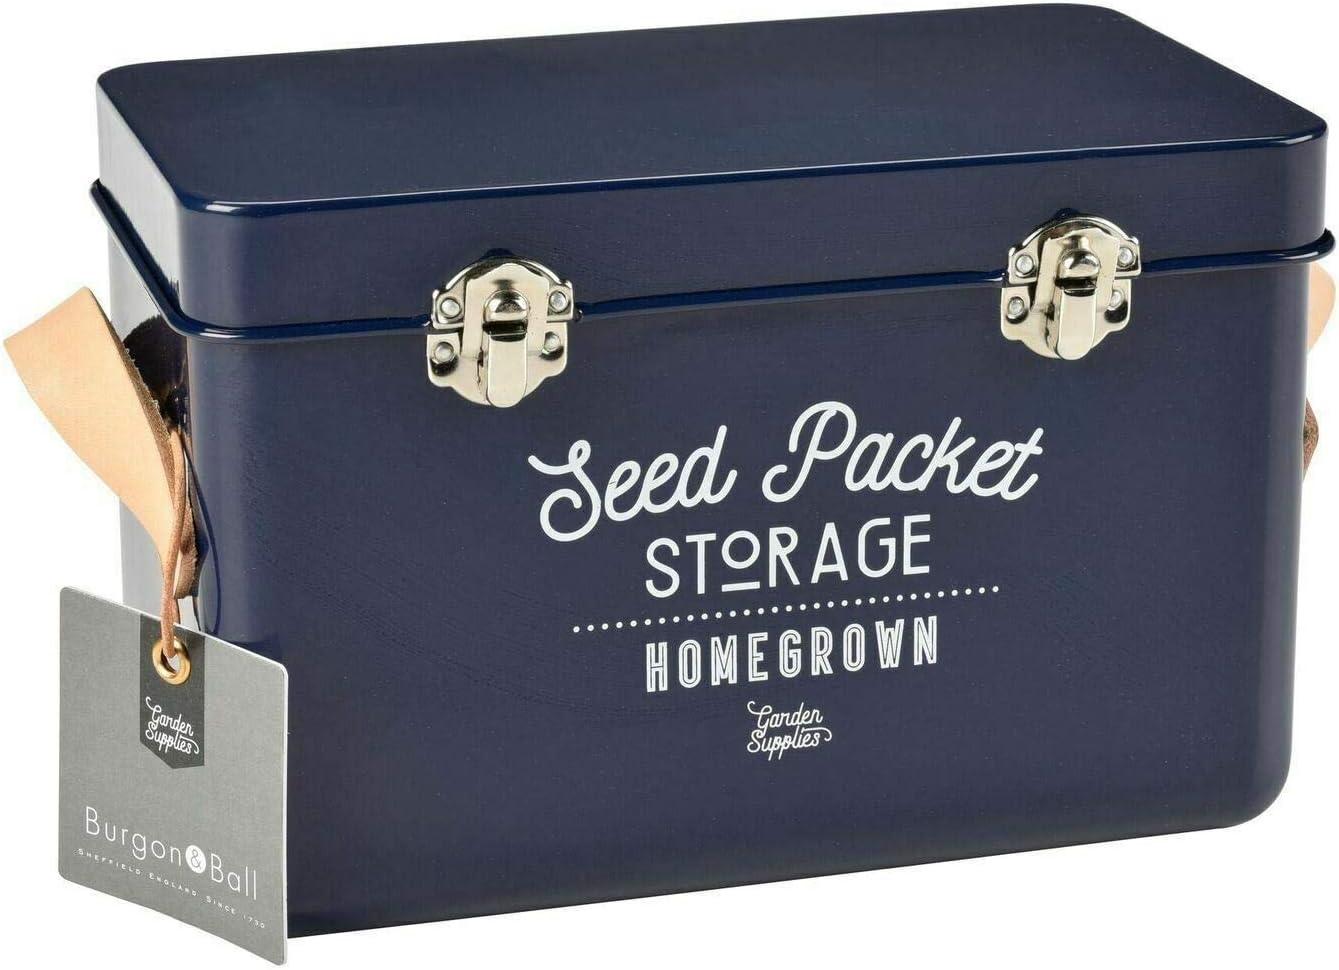 Burgon & Ball Seed Packet Storage Tin Atlantc Blue